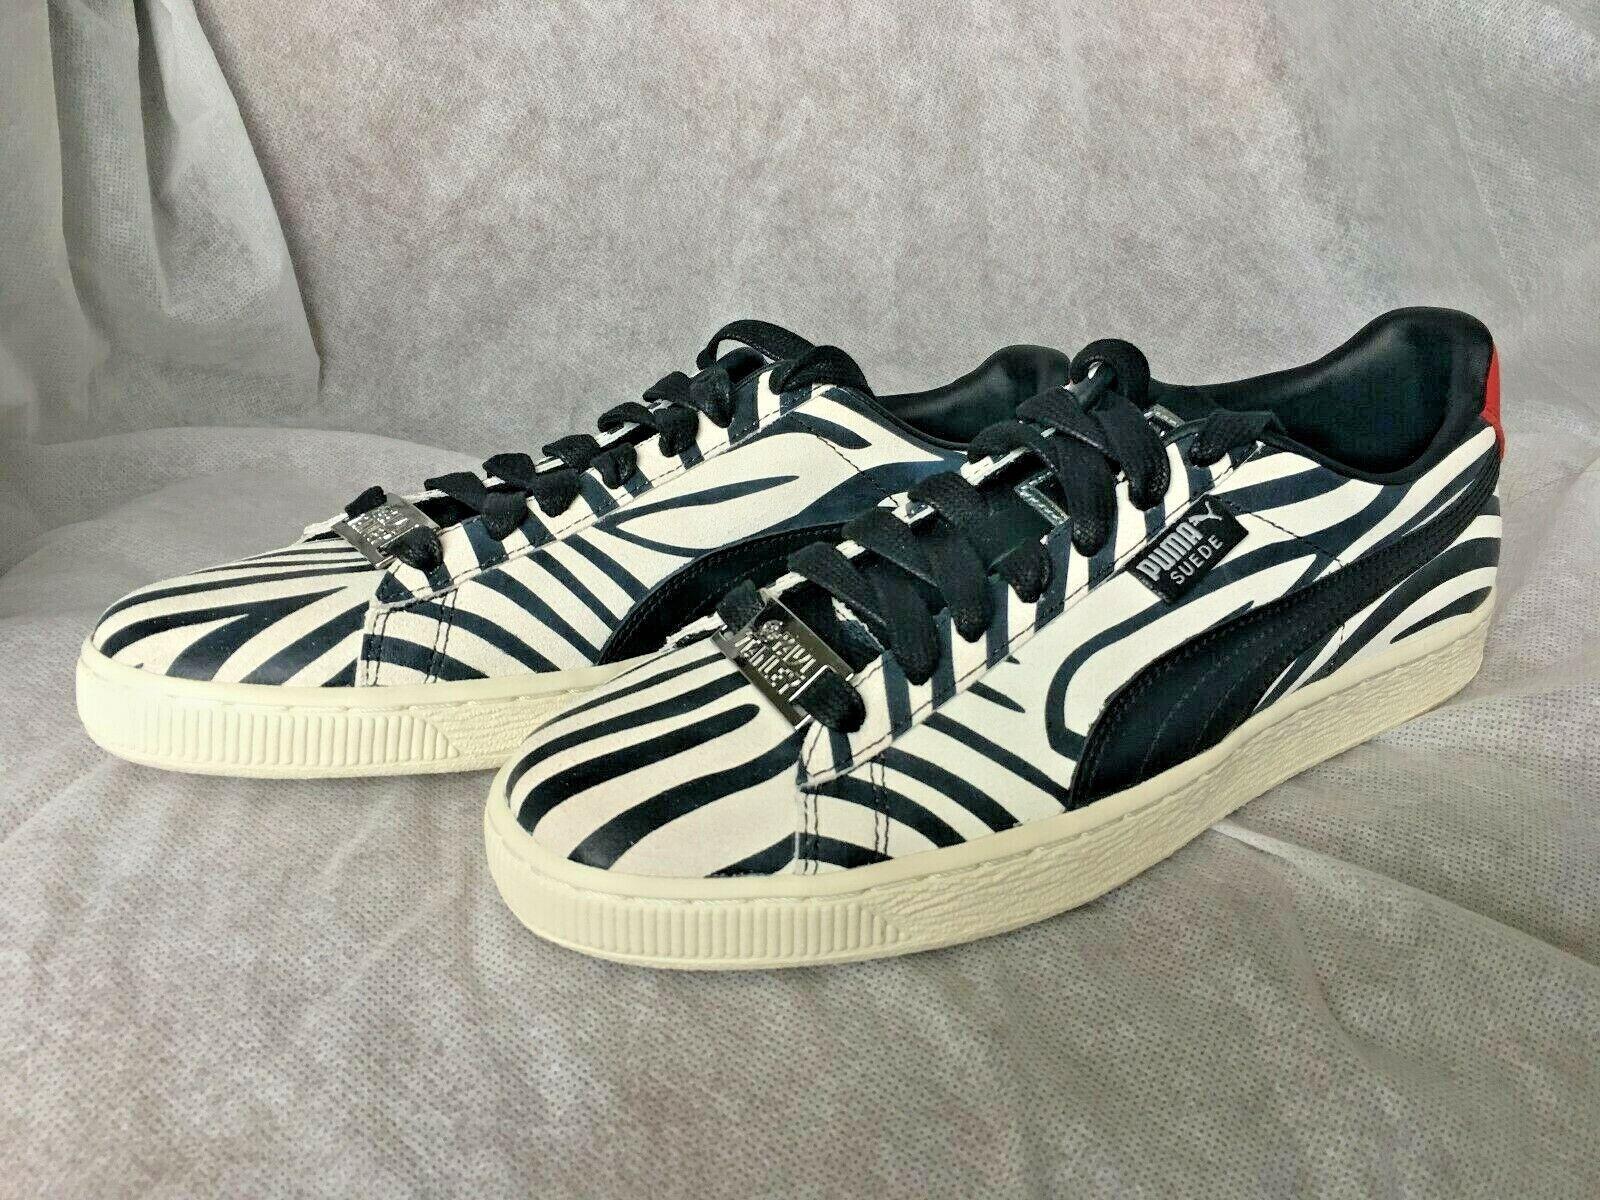 Puma x Gamuza Paul Stanley Kiss Cebra Zapatos para hombre